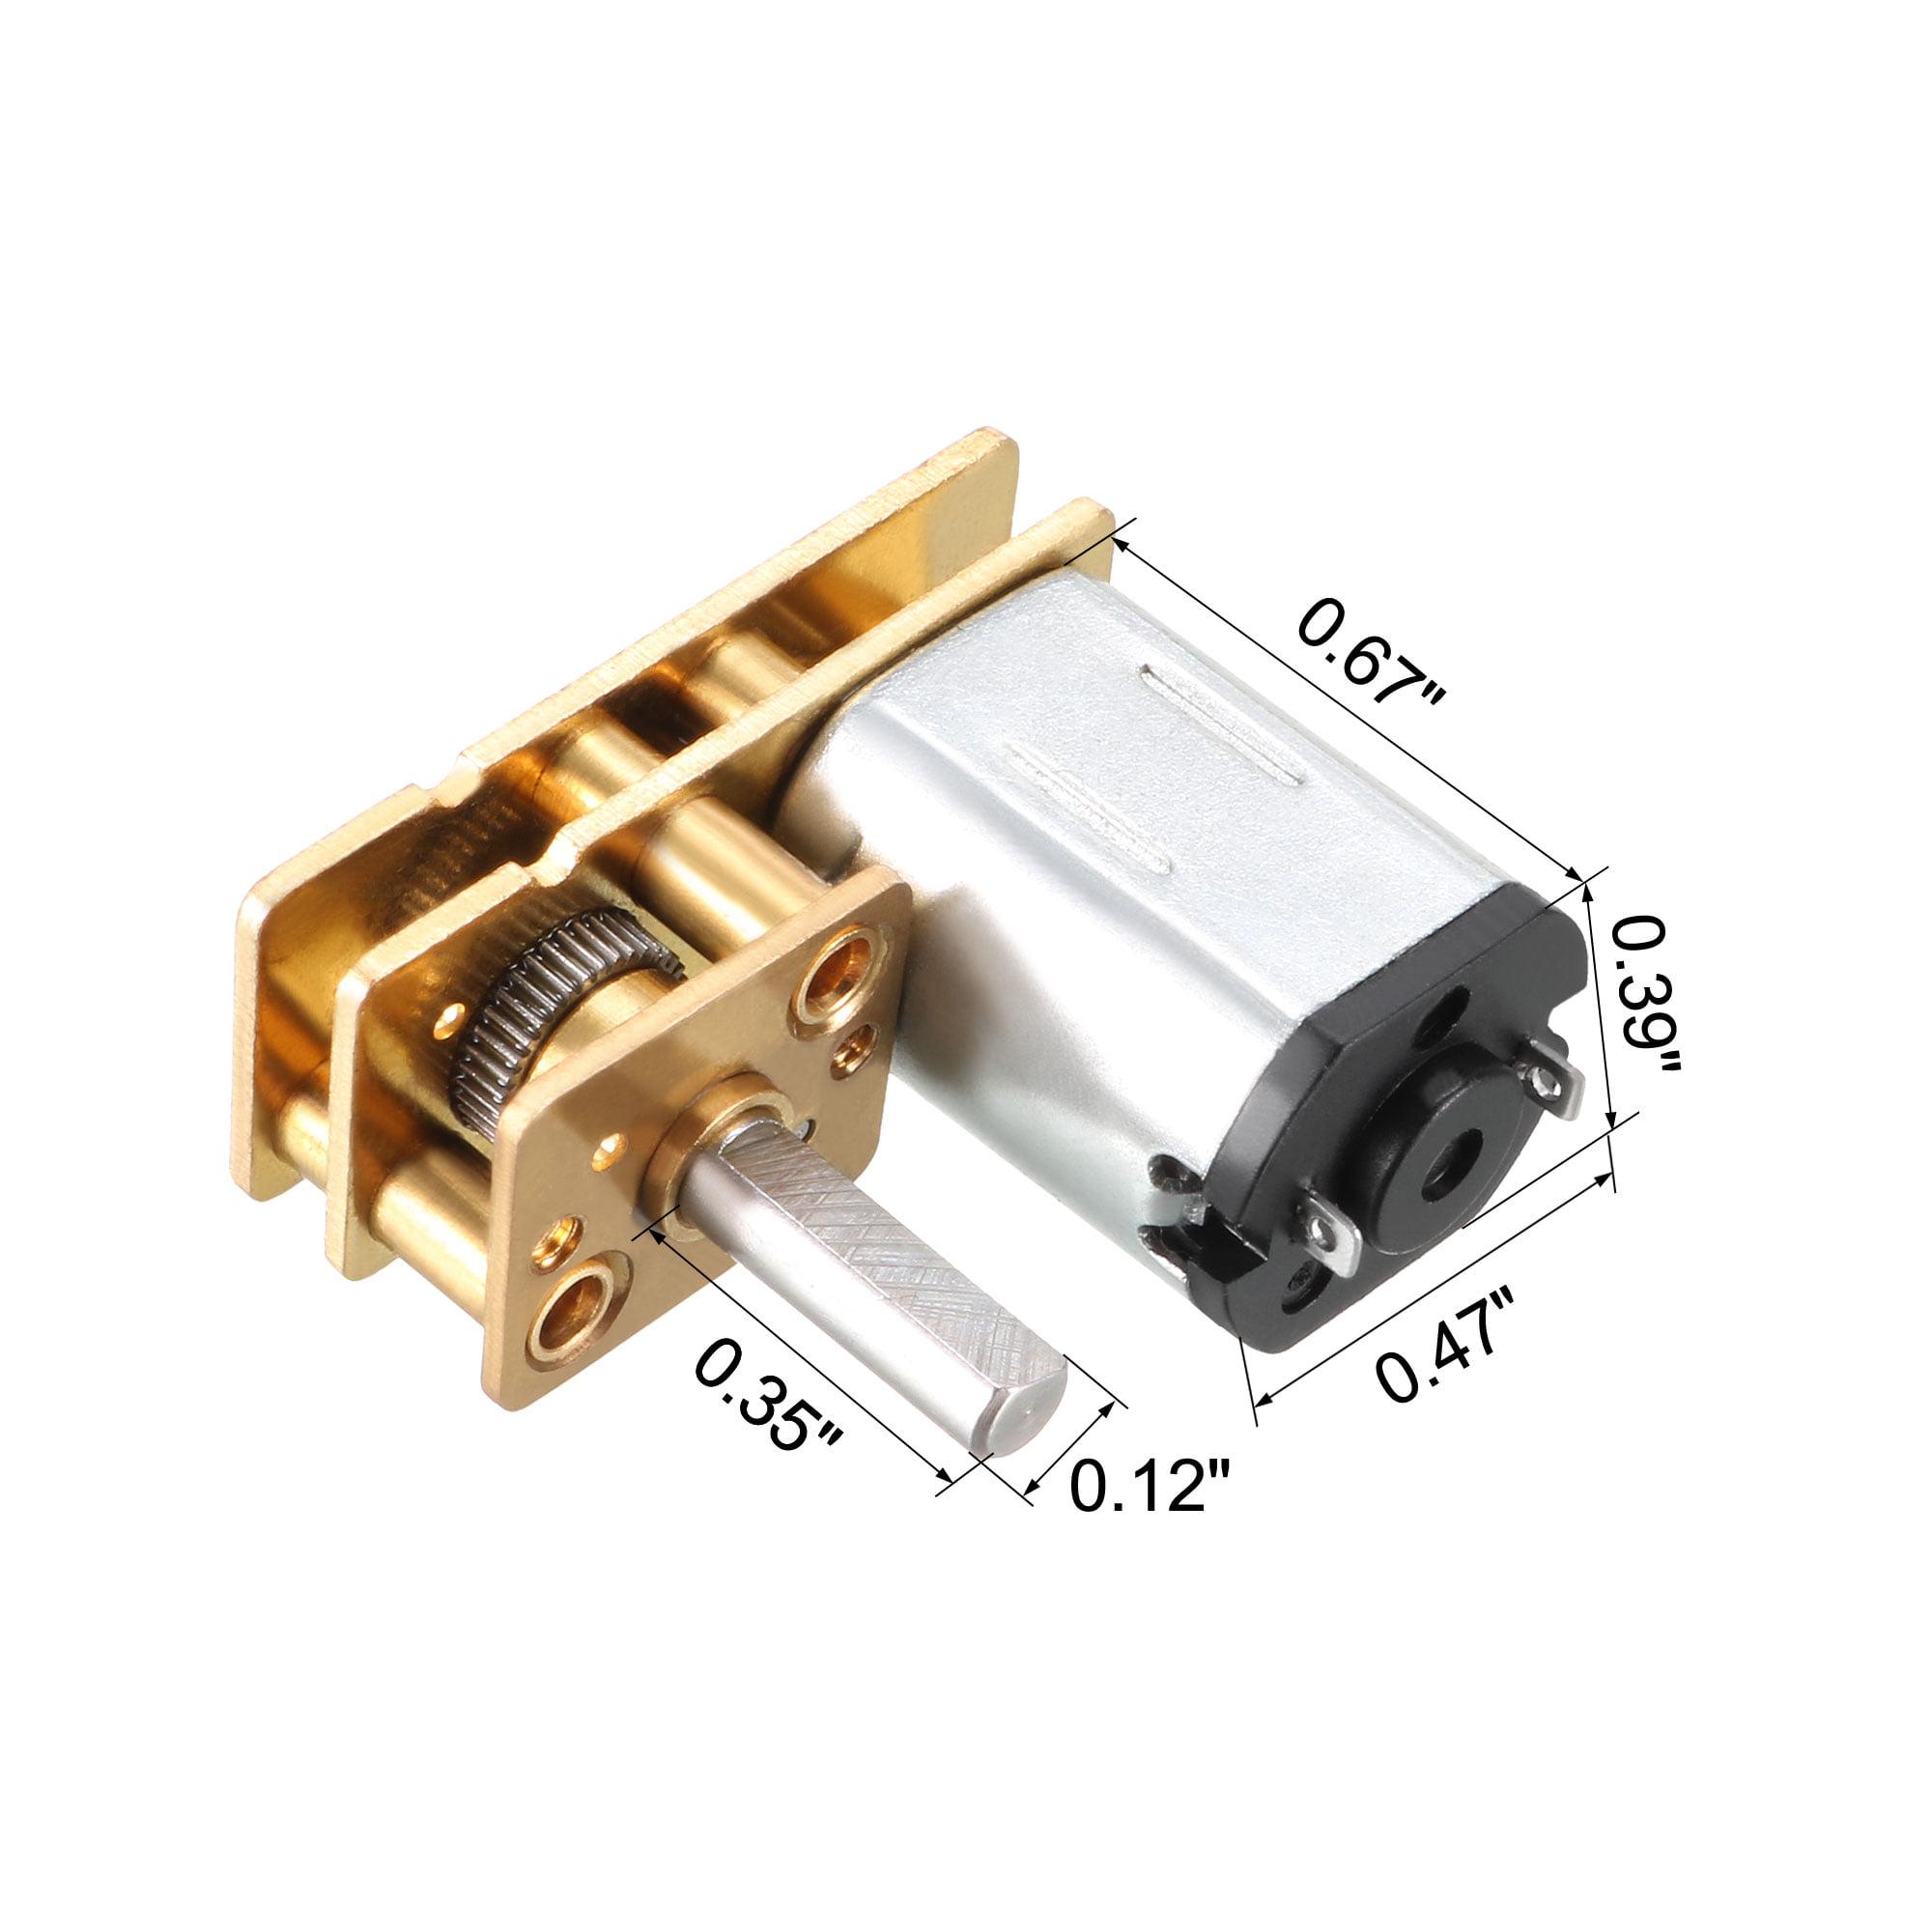 DC 12V 1000RPM Mini Motor Gear Box Motor for RC Car Robot Model DIY Engine  Toy